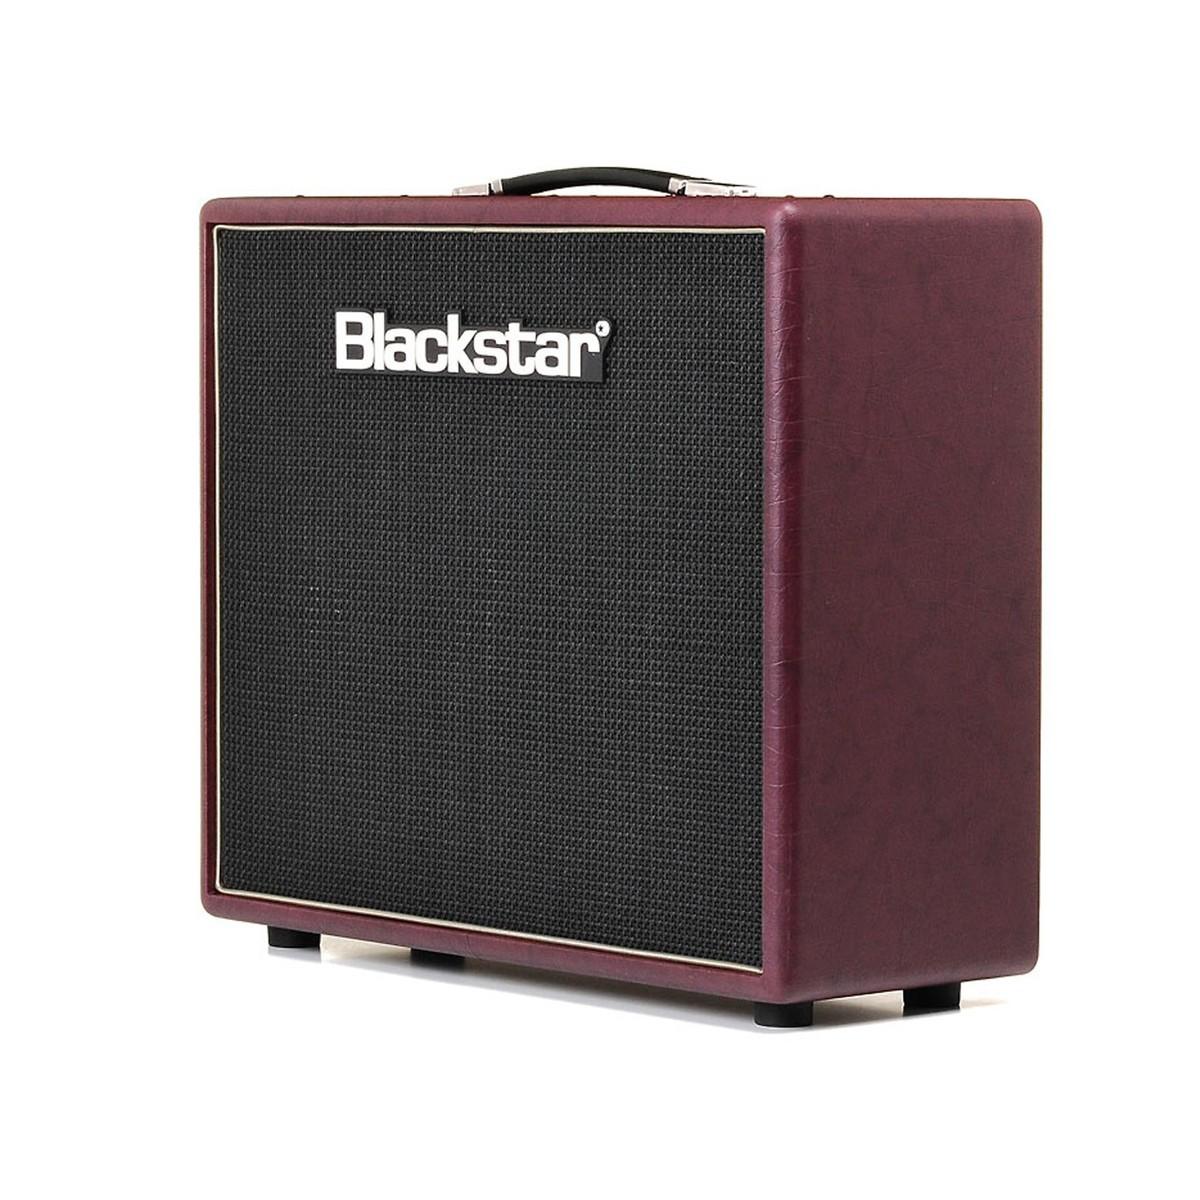 blackstar artisan 15 1x12 handwired combo at gear4music. Black Bedroom Furniture Sets. Home Design Ideas